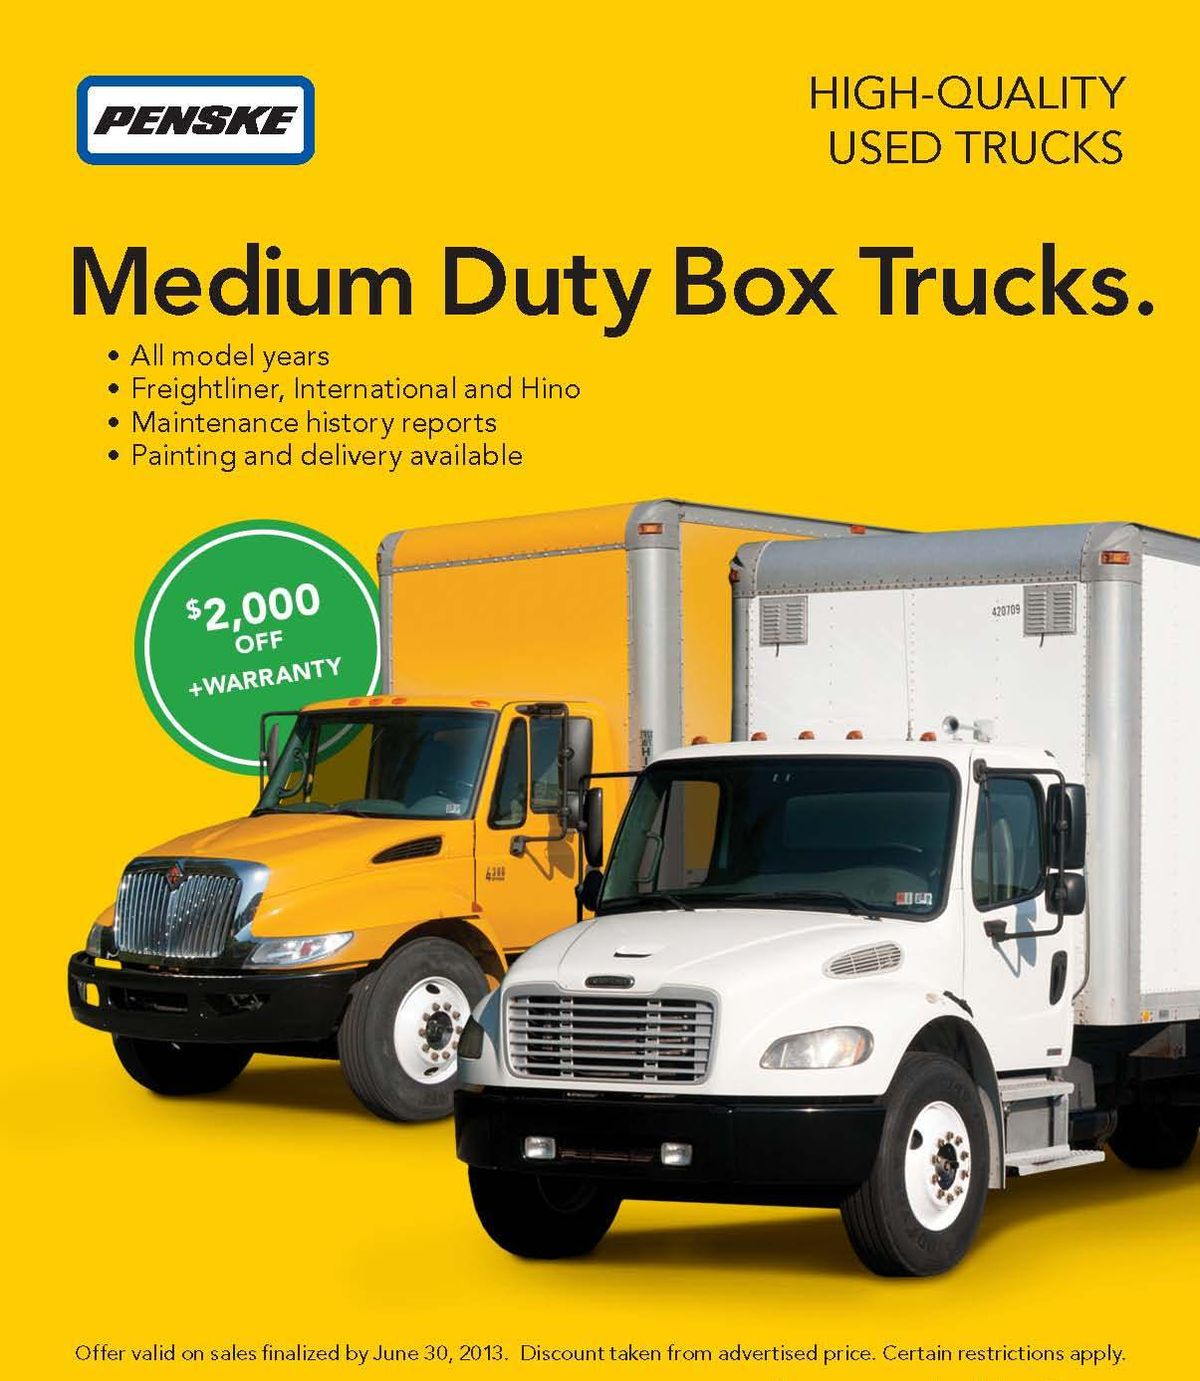 Penske Offering $2,000 Discount on Medium-Duty Box Truck Purchases